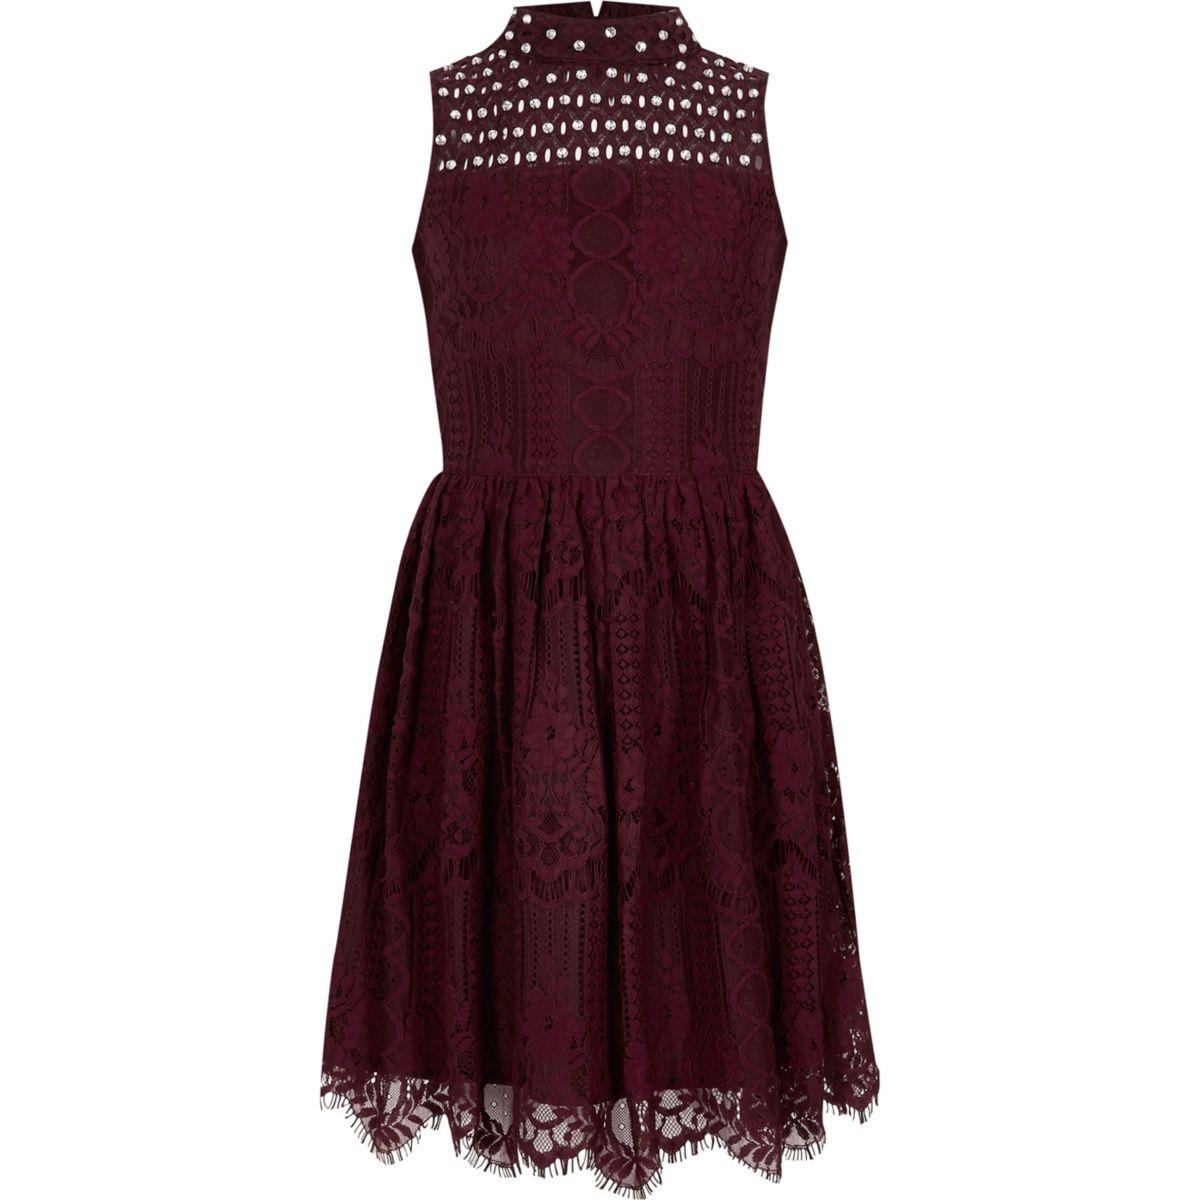 Girls burgundy lace high neck prom dress